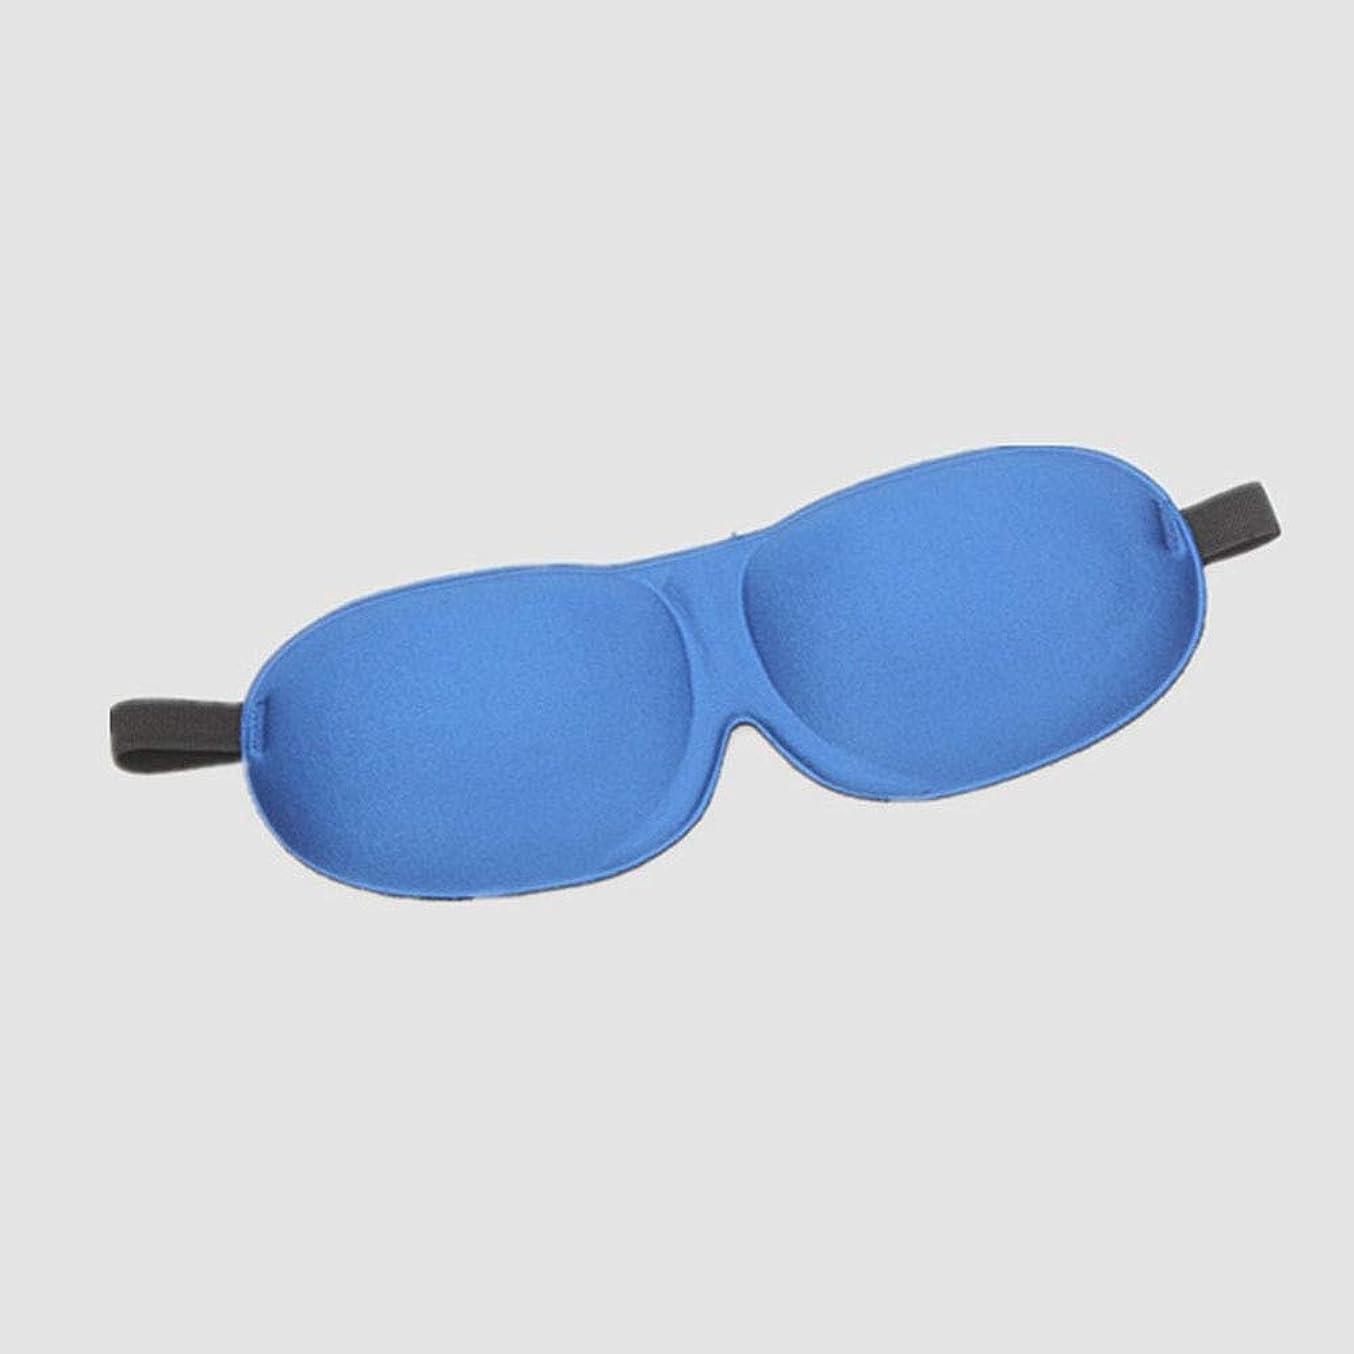 NOTE 睡眠アイマスク目隠しアイシェードアイパッチ目隠し用ヘルスケア旅行リラックス睡眠補助カバーアクセサリー